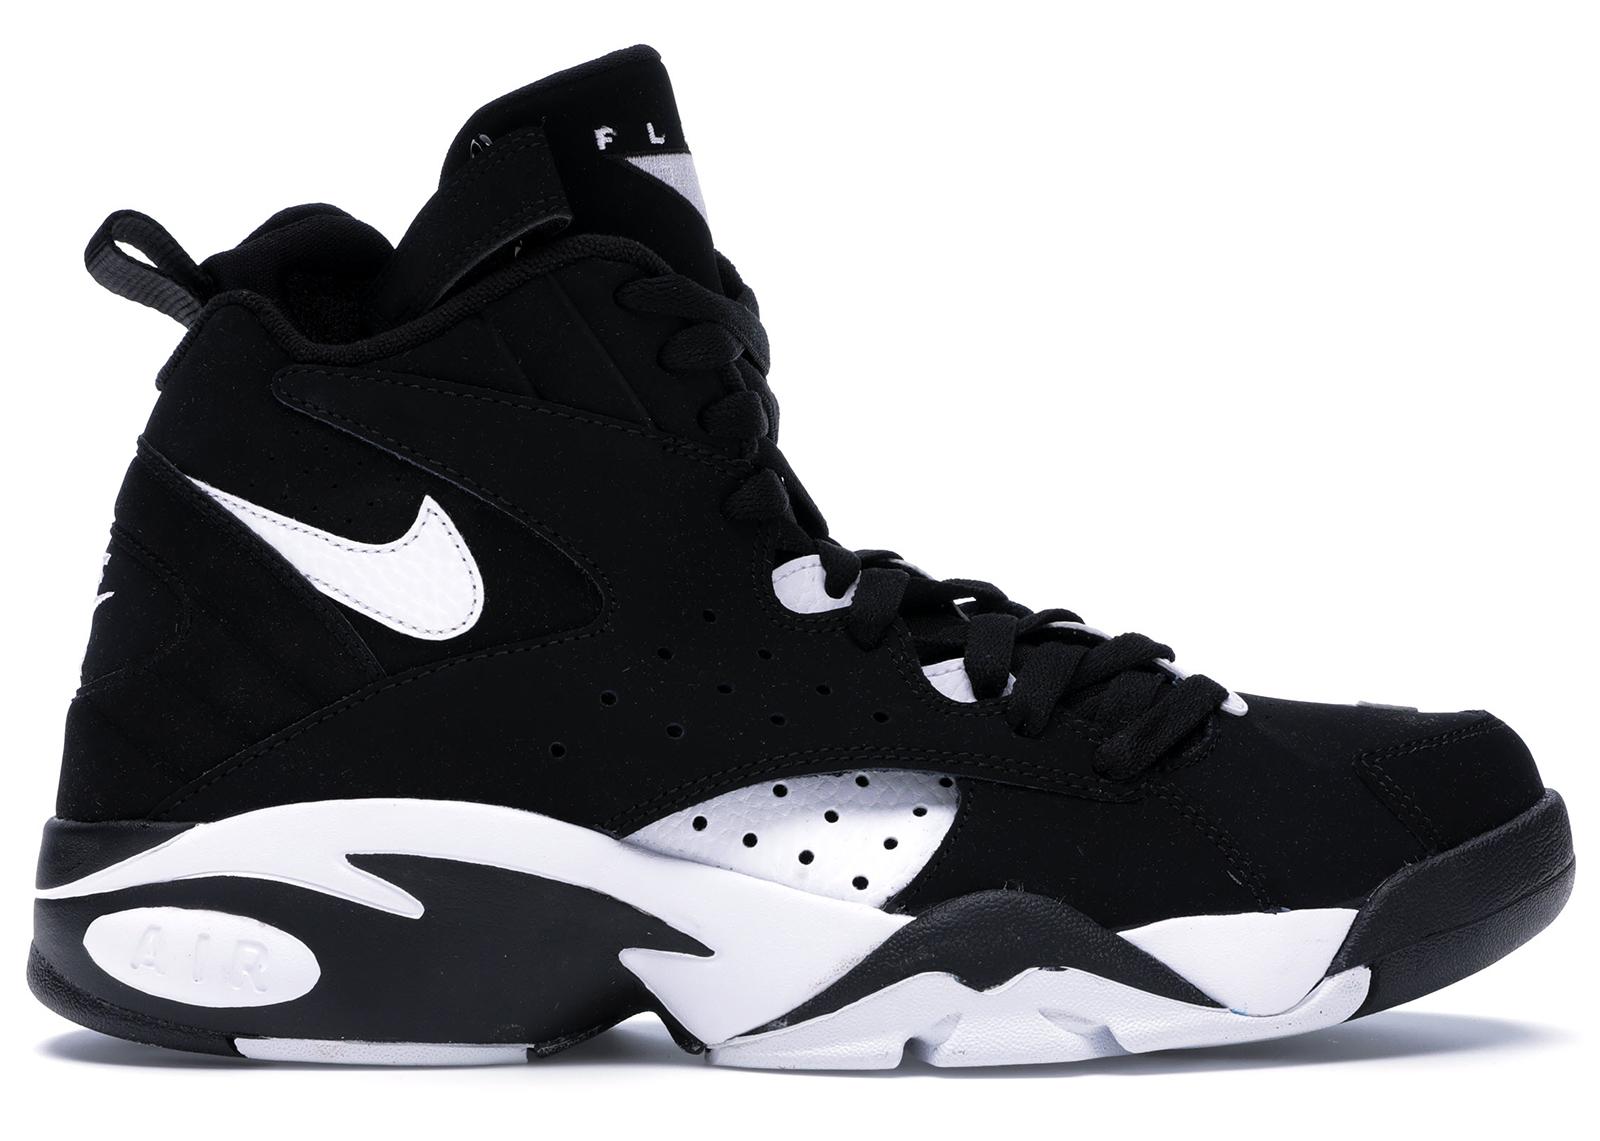 Nike Air Maestro 2 LTD Black White